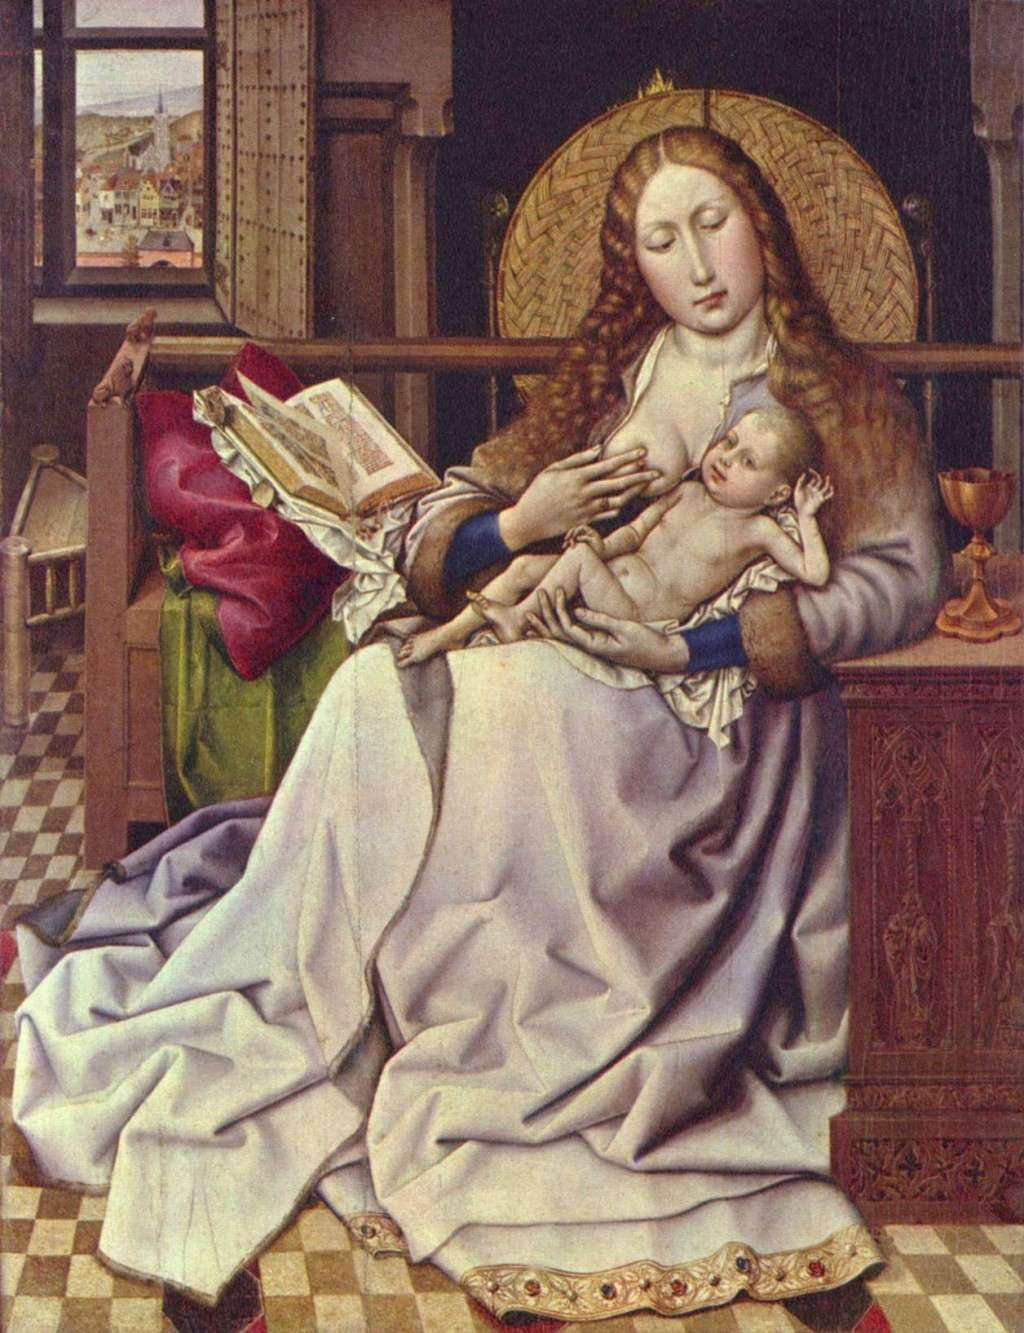 Les peintures religieuses de Robert Campin La_vie11